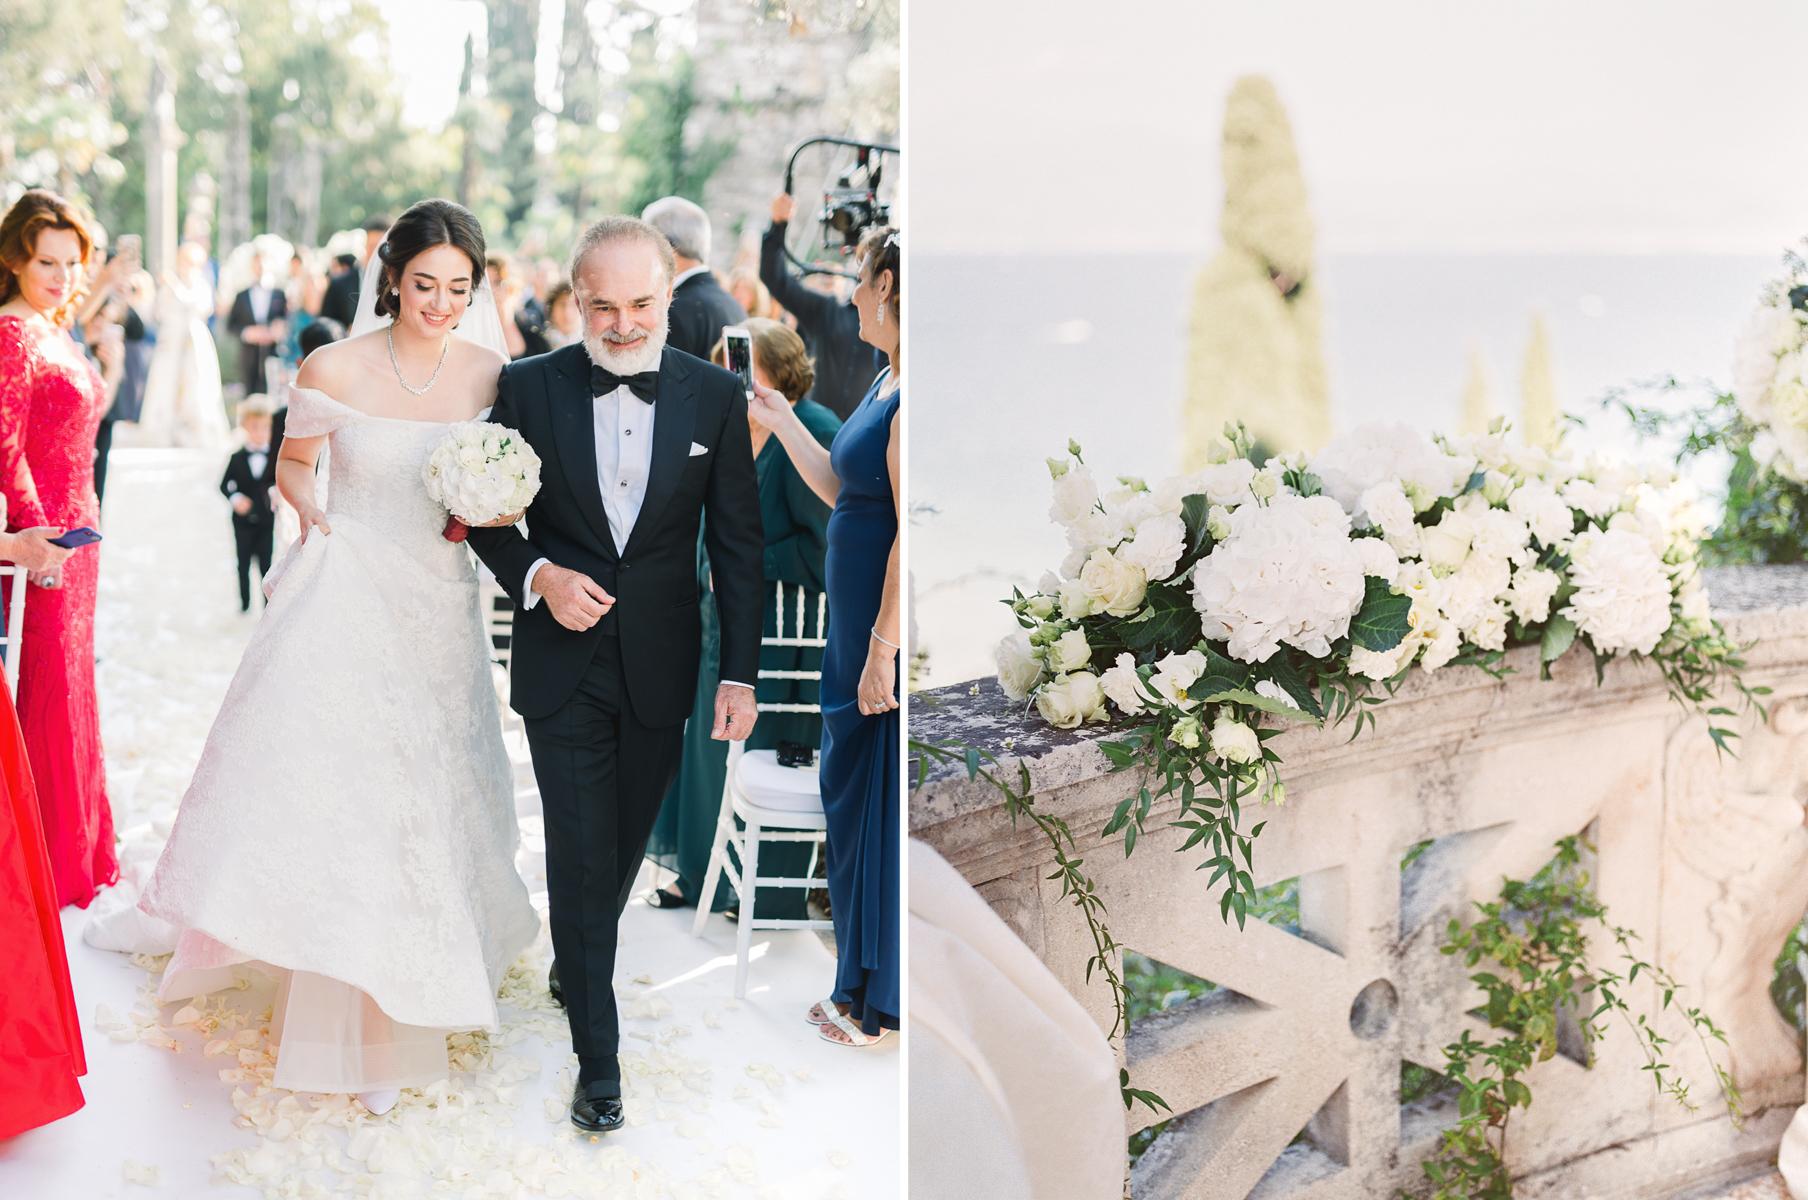 Palace_Villa_Cortine_Hotel_Italian_Wedding_Photographer_Sirmione_AKP-32-Nicole_Albert_Khudoyan.jpg